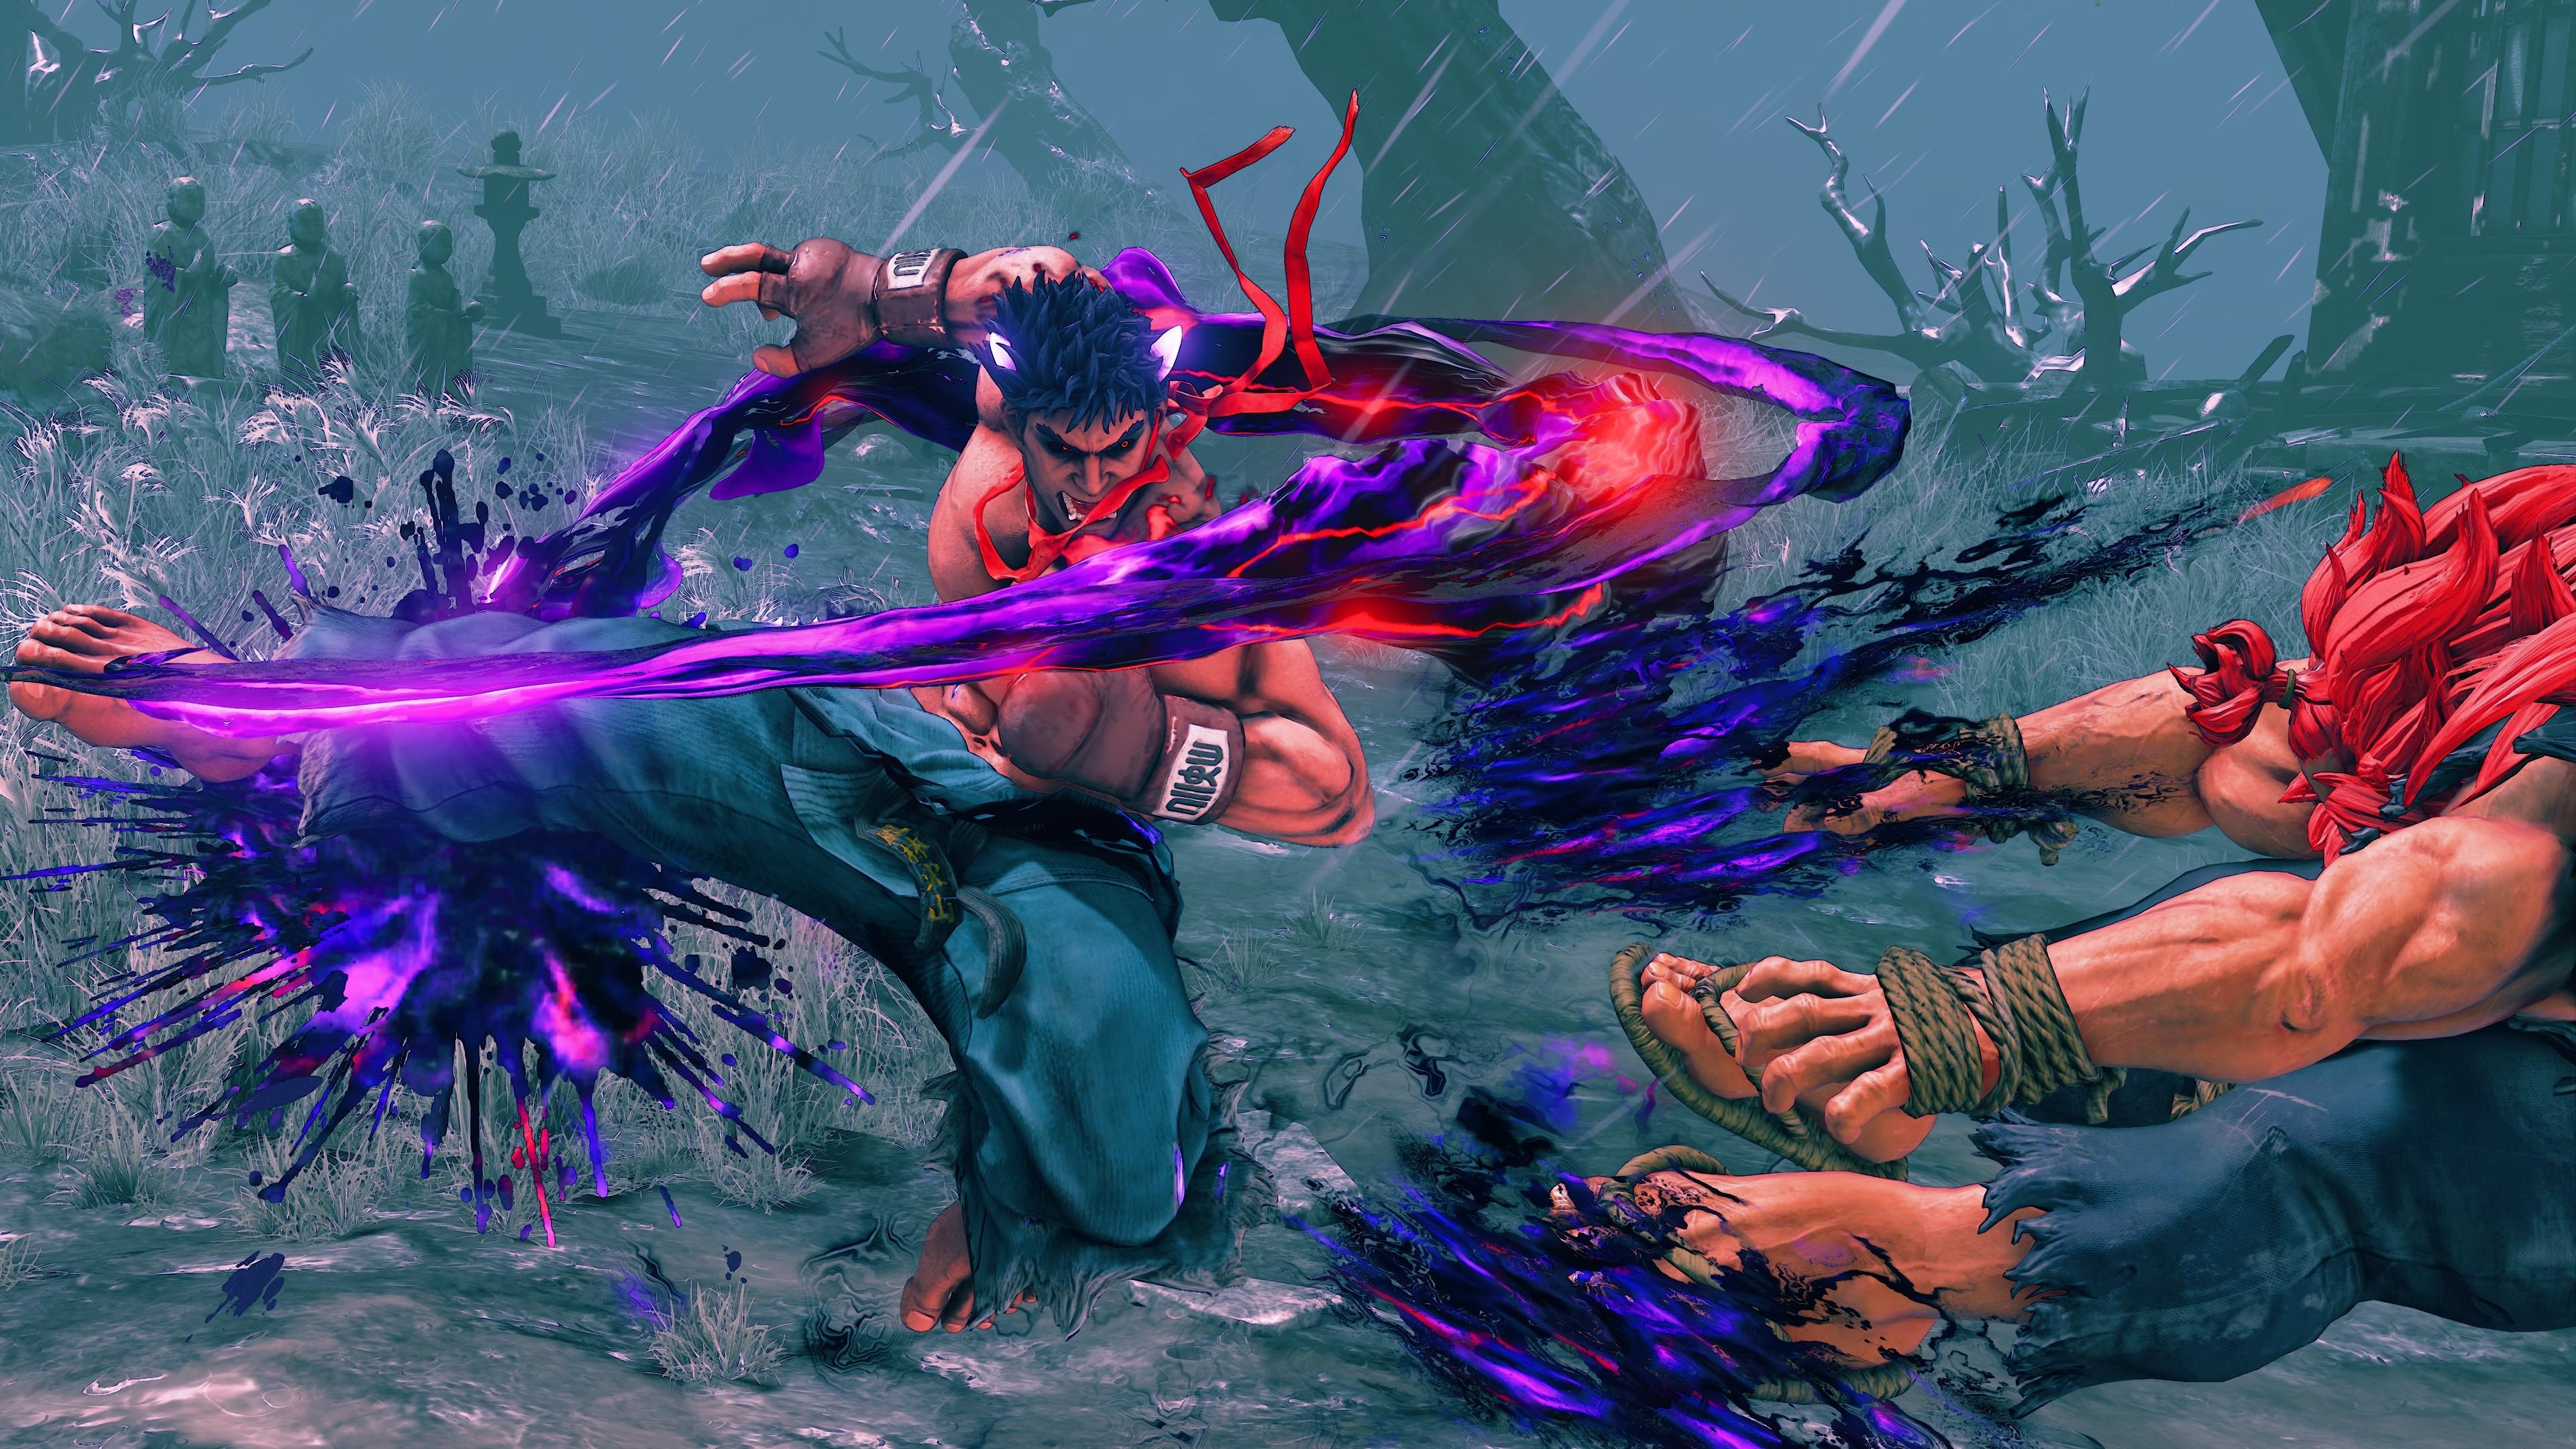 Res: 3840x2160, Street Fighter 5 - Kage Capcom